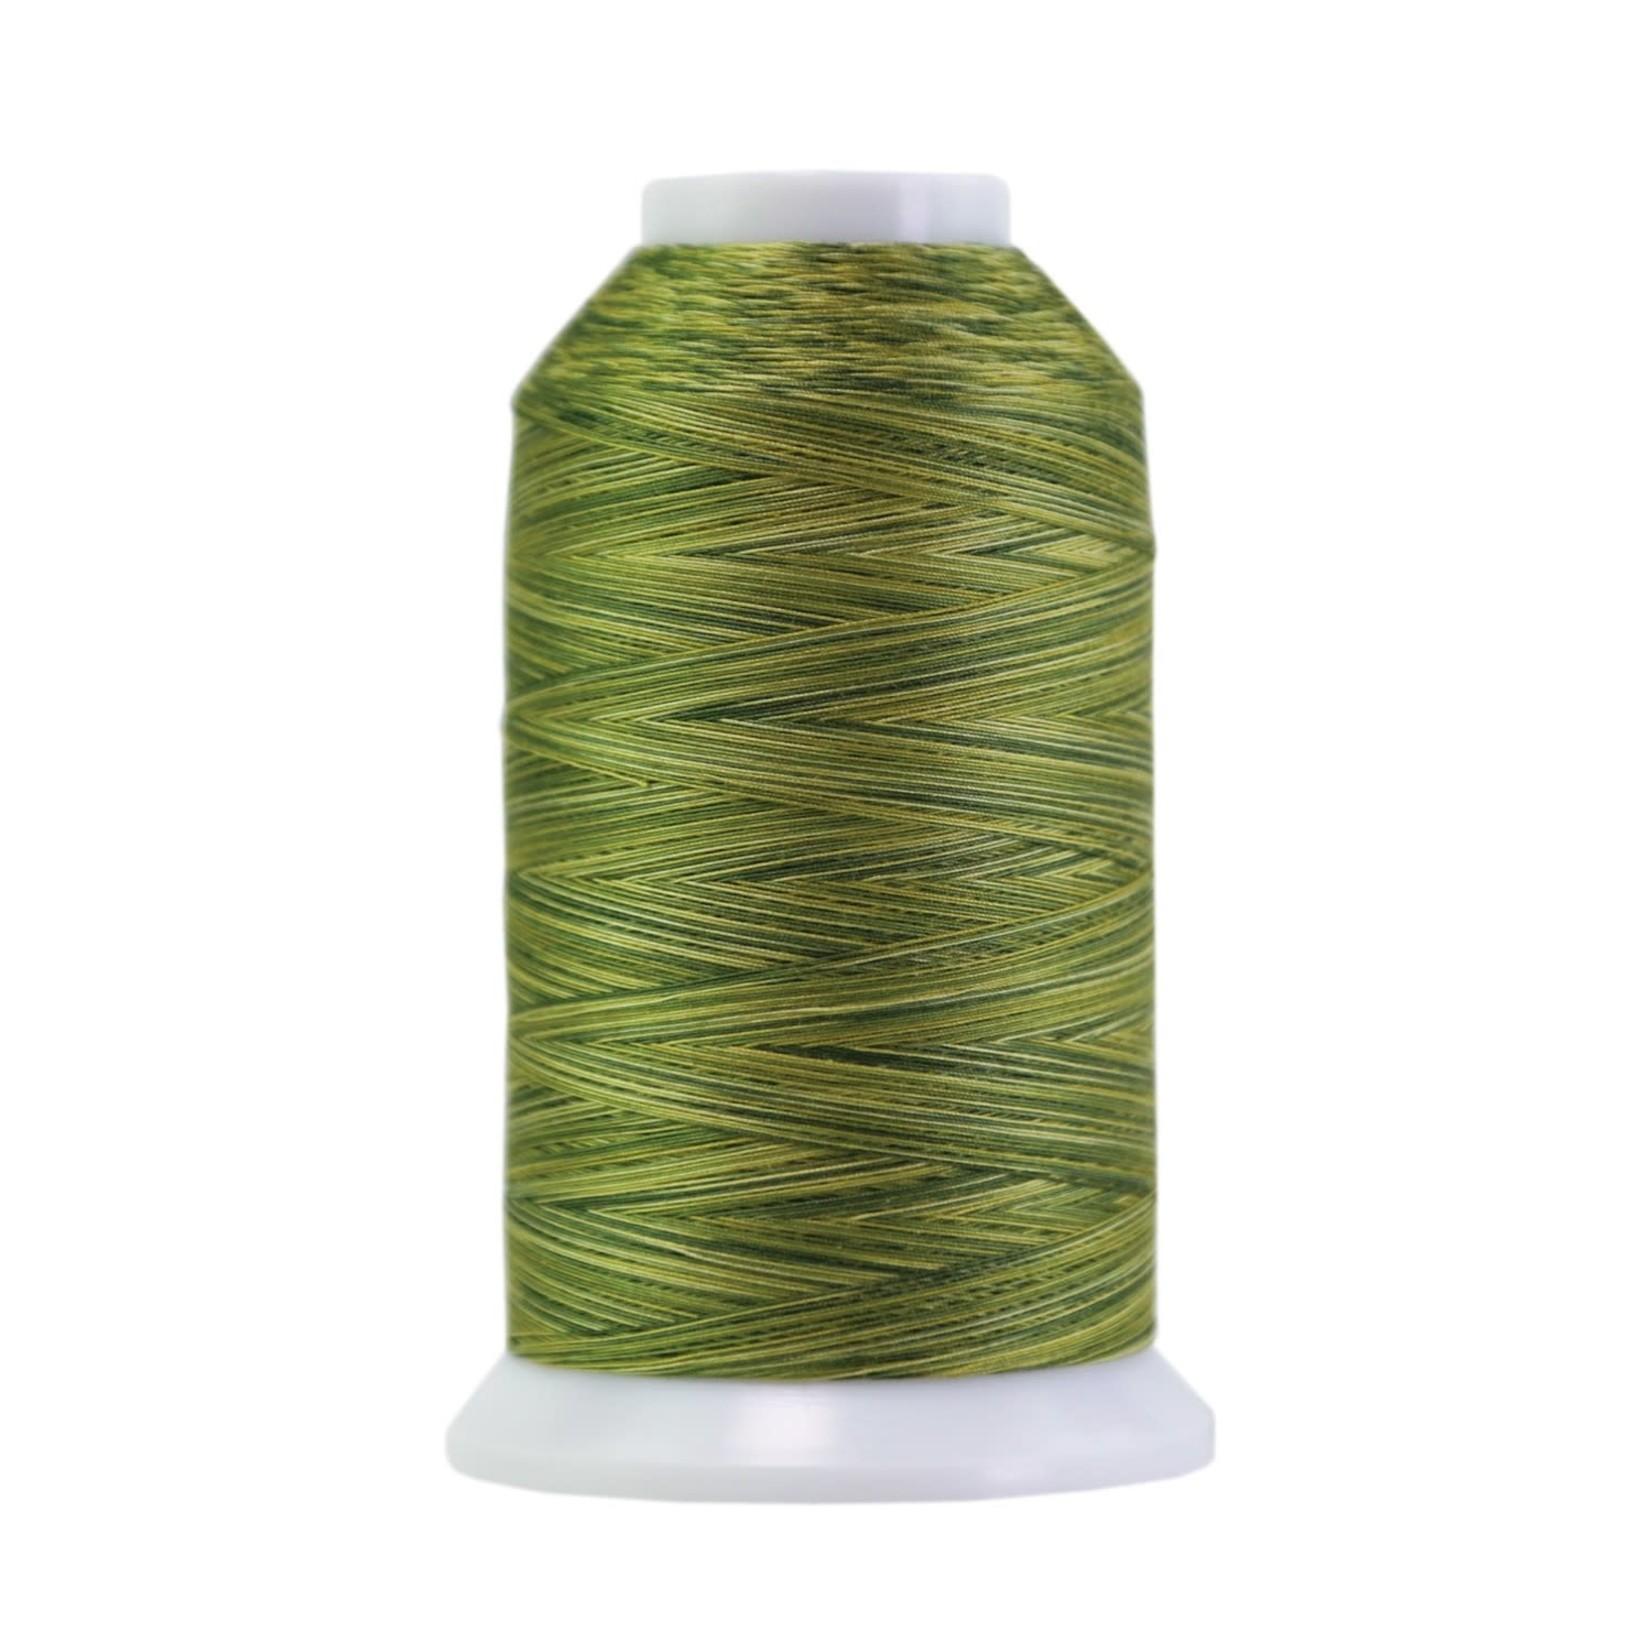 Superior Threads King Tut - #40 - 1828 m - 1041 Highlands